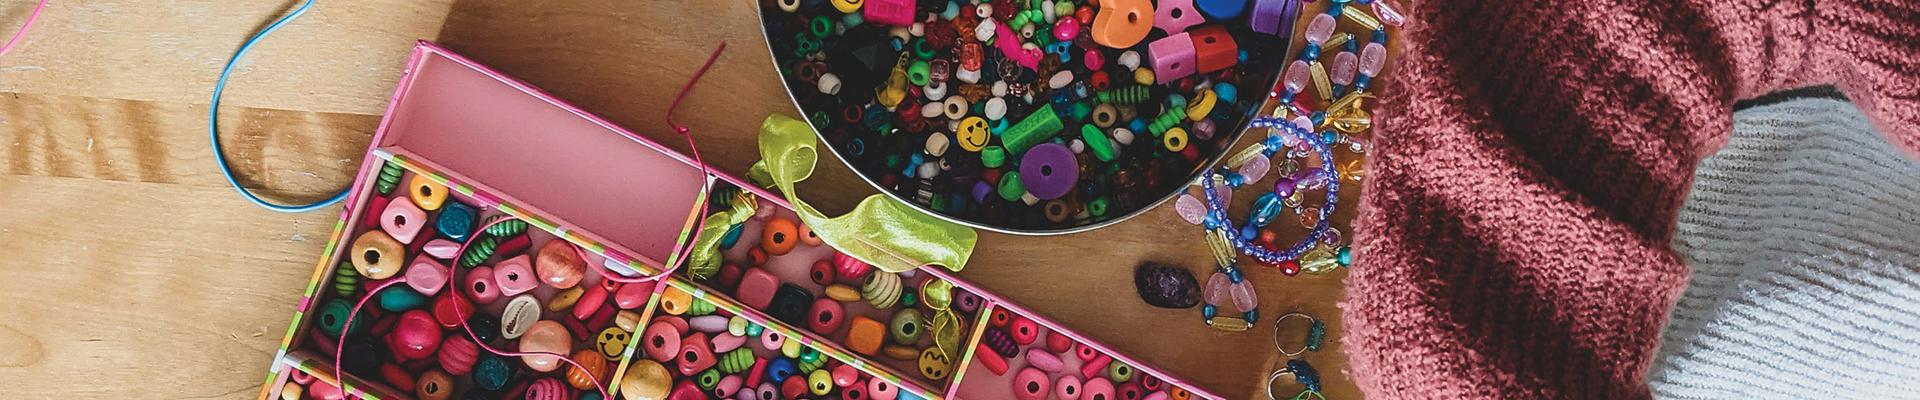 crafts_kids